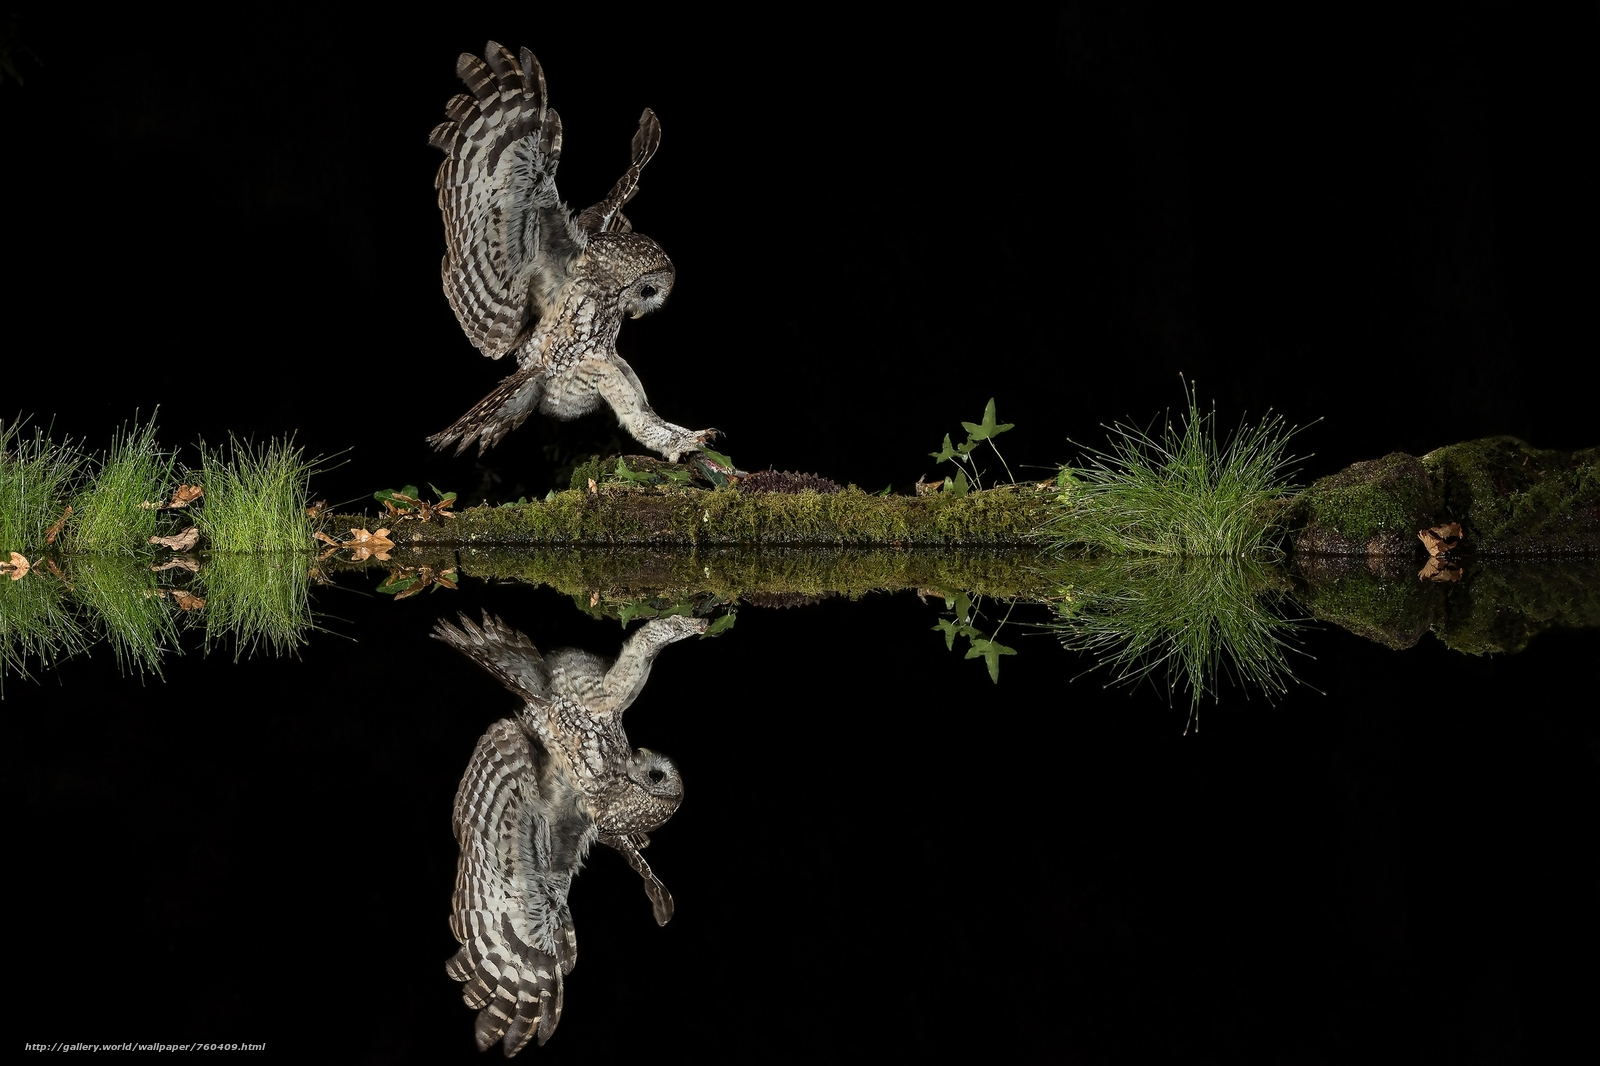 night, water, owl, predator, reflection